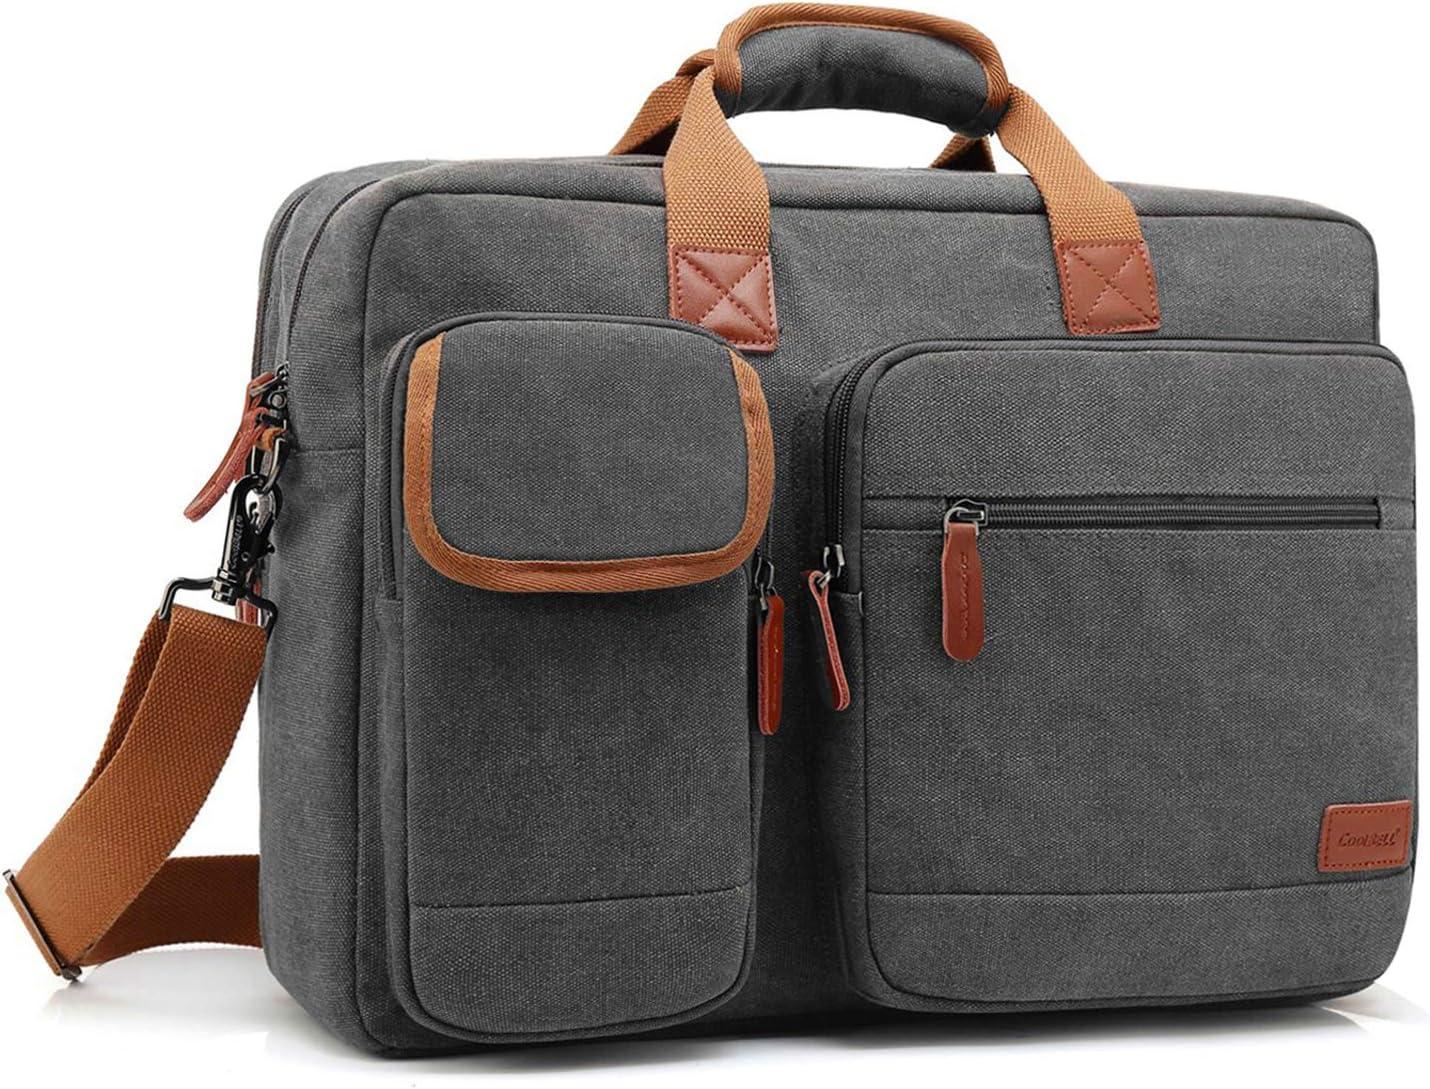 CoolBELL 17.3 Inches Laptop Messenger Bag Briefcase Protective Shoulder Bag Multi-Functional Business Bag for Men/Women/Travel (Canvas Dark Grey)